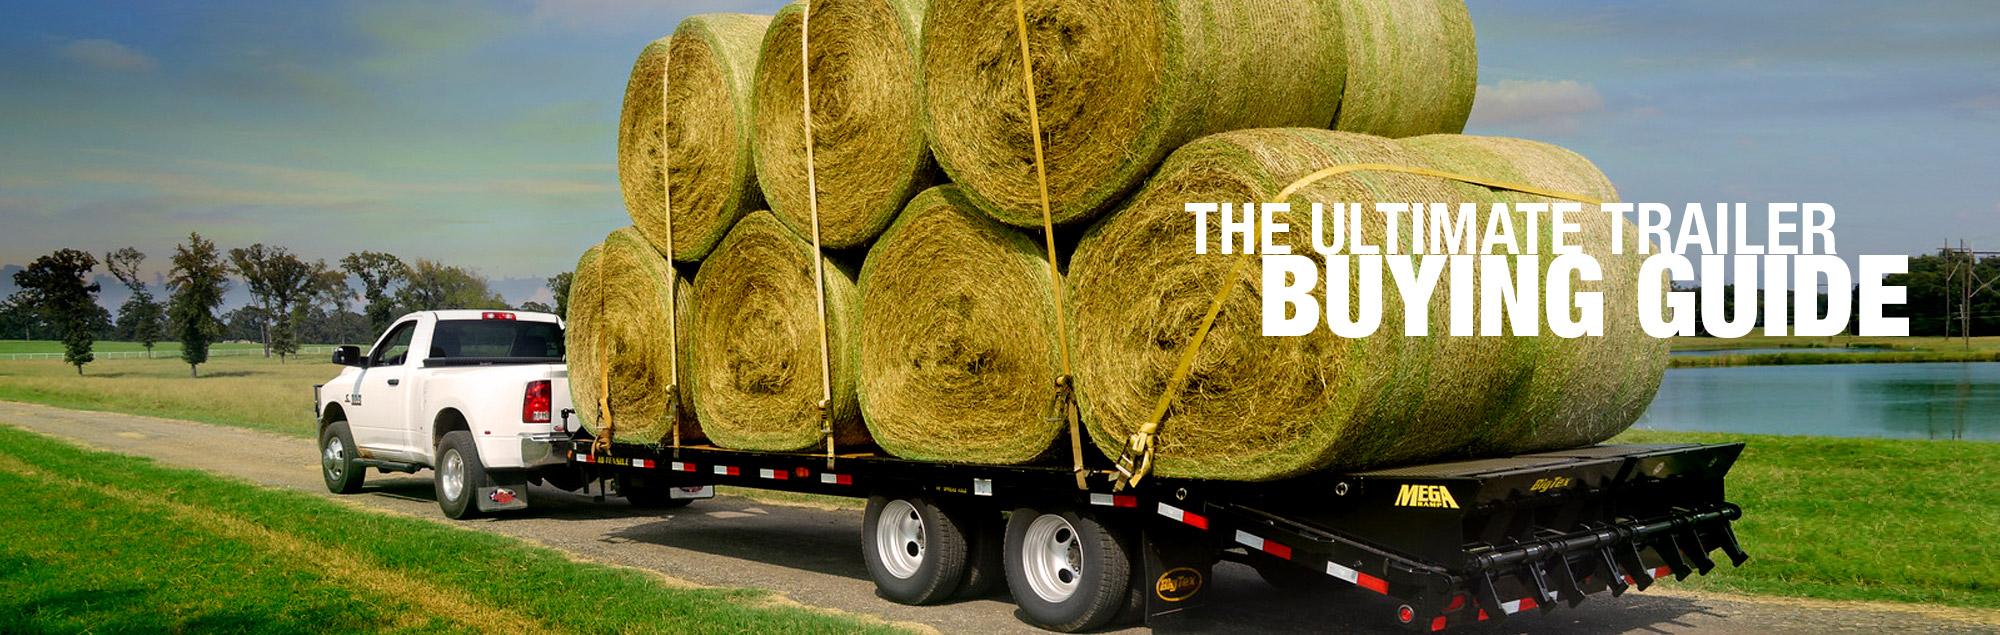 Big Tex Trailer World's Trailer Buying Guide